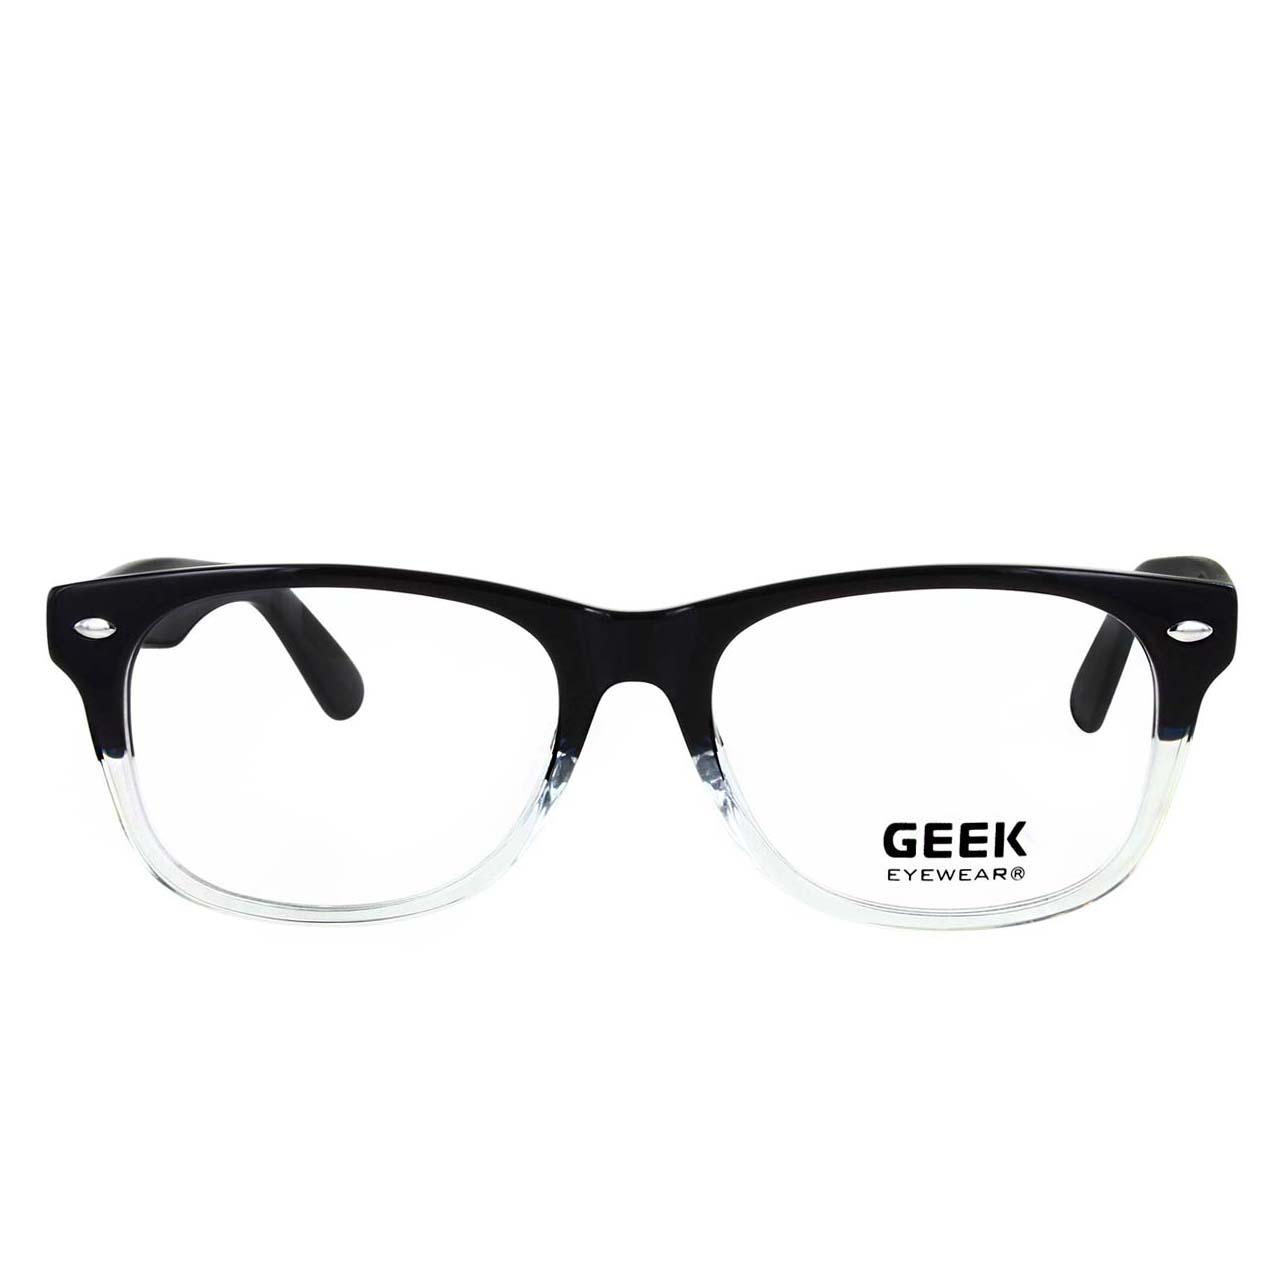 1079e123b8c GEEK Eyewear® Rx Eyeglasses style RAD 09